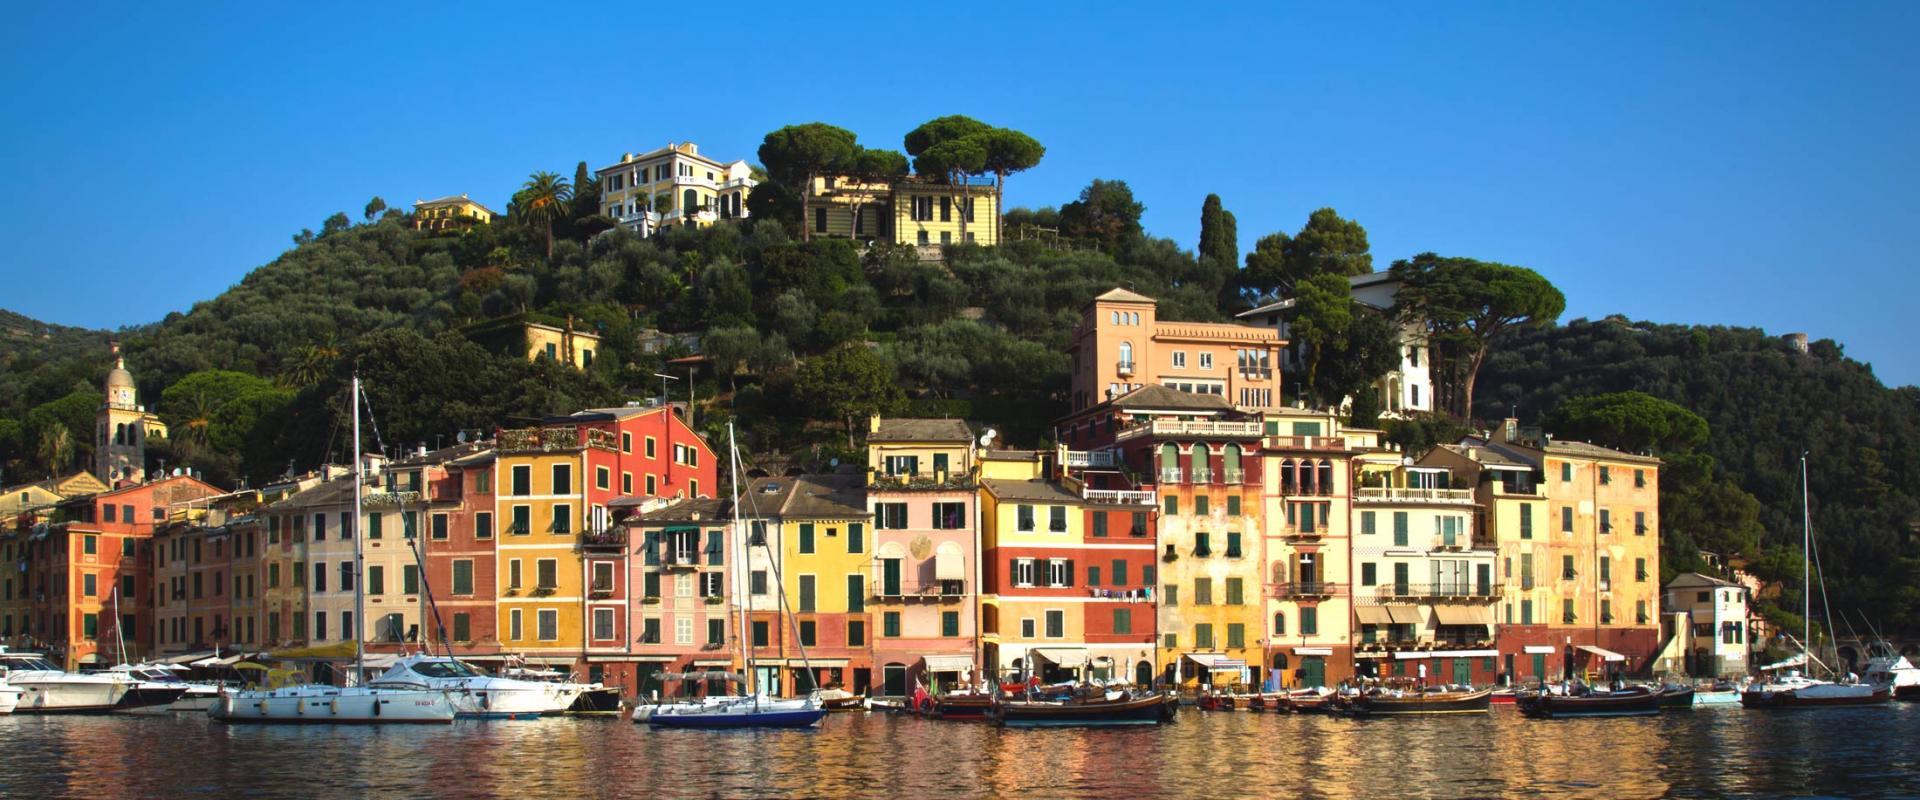 Visit of Portofino Liguria